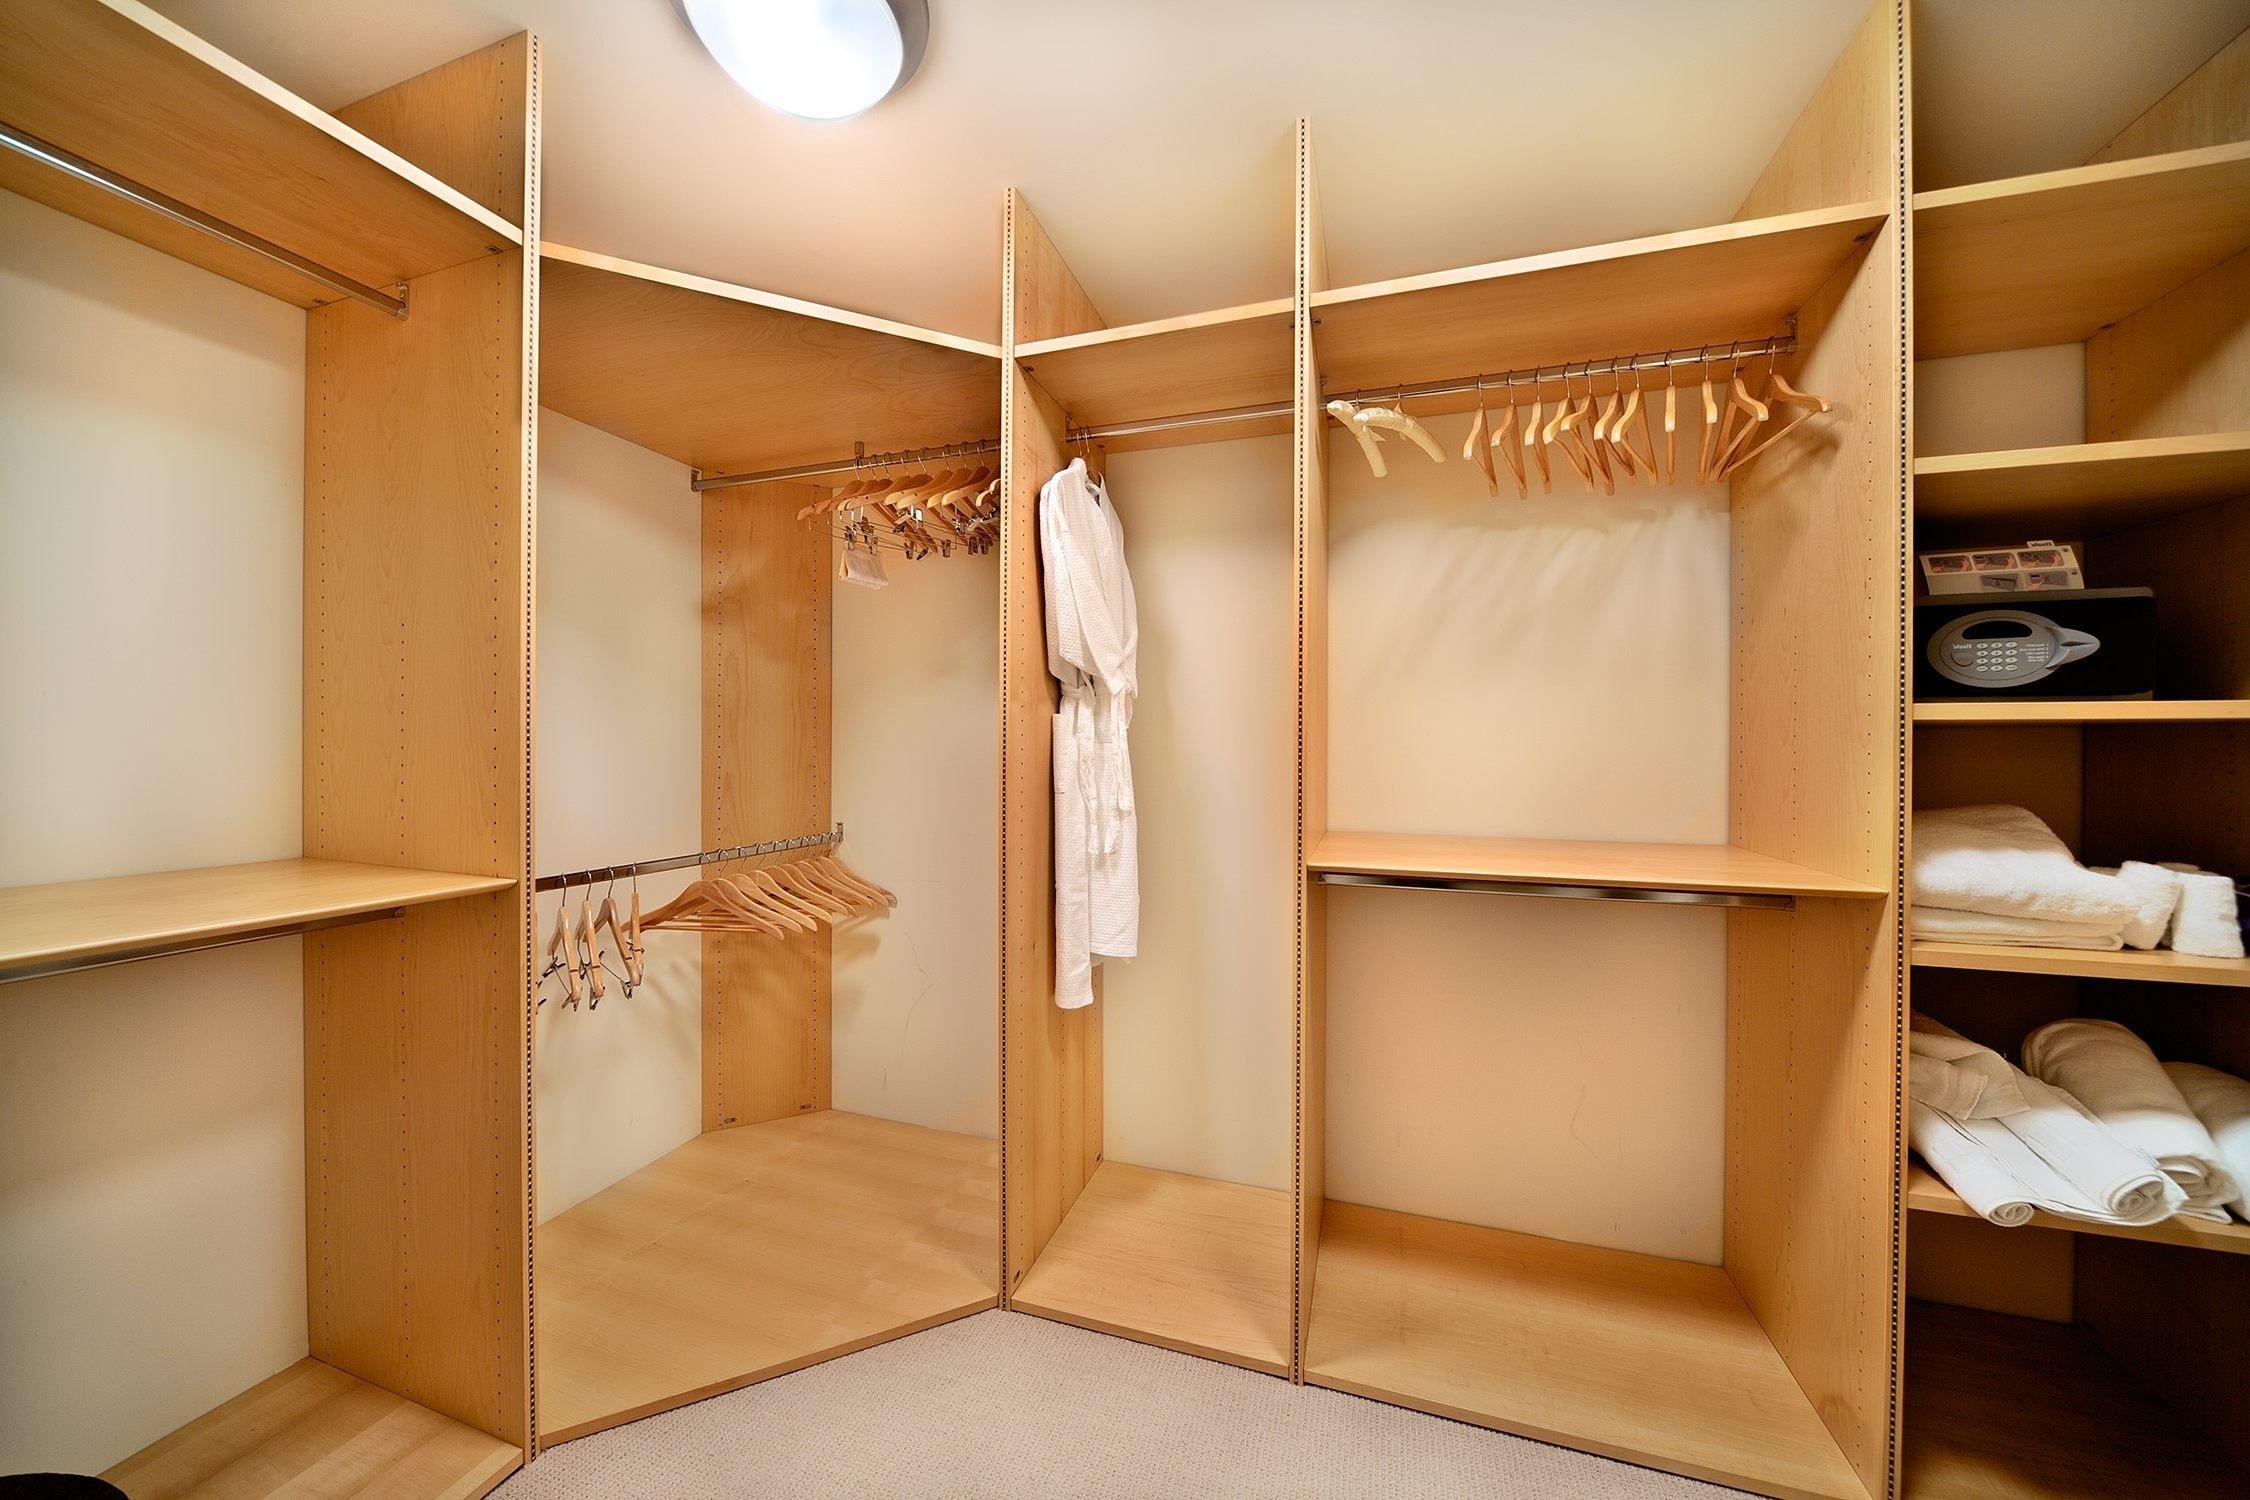 10 Fantastic Small Walk In Closet Design Ideas interior small walk in closet organization systems designs plans